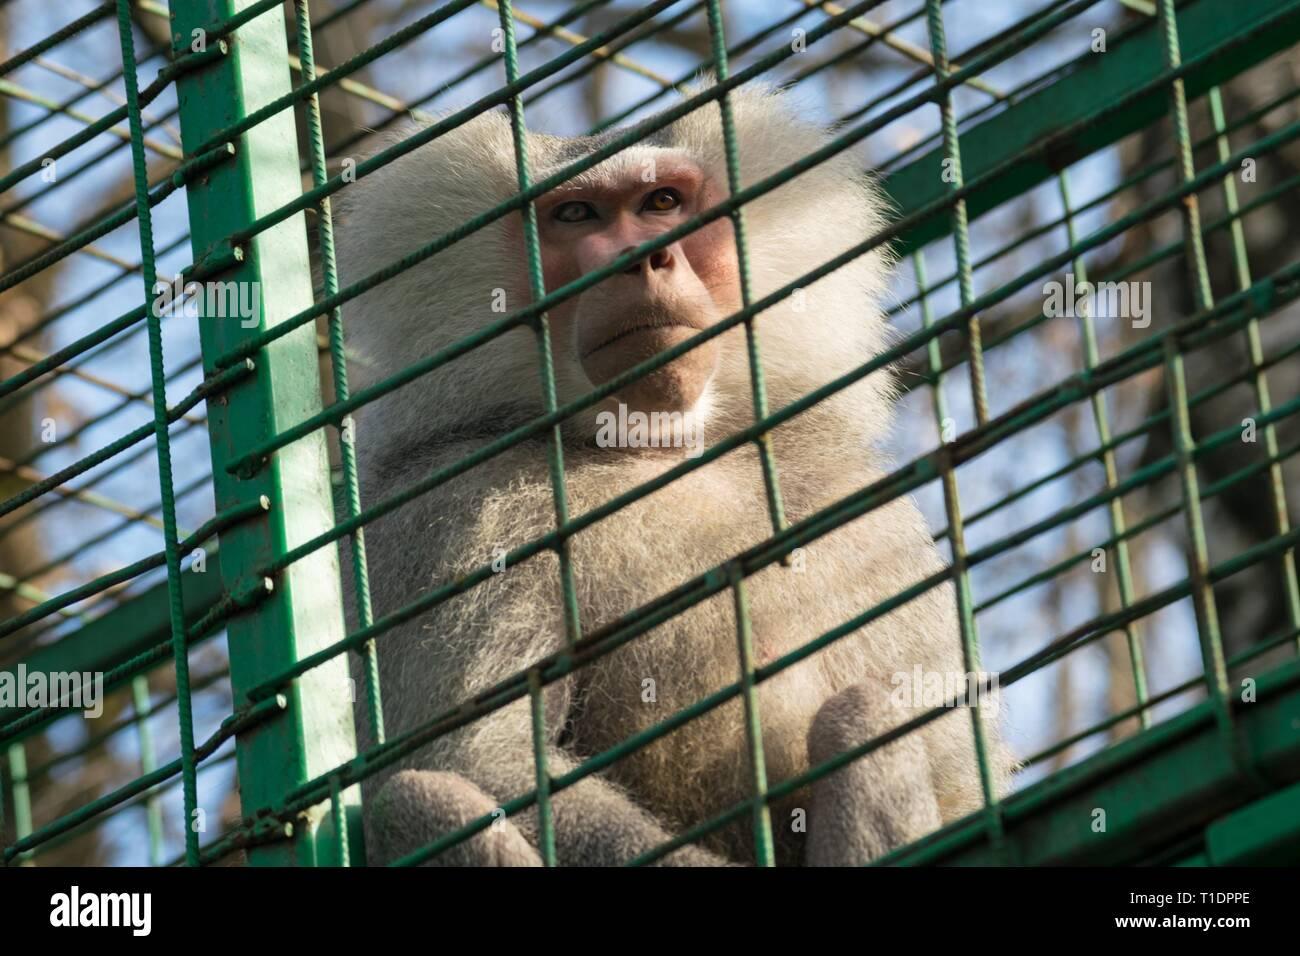 sad monkey in cage - macaque monkey held captive Stock Photo